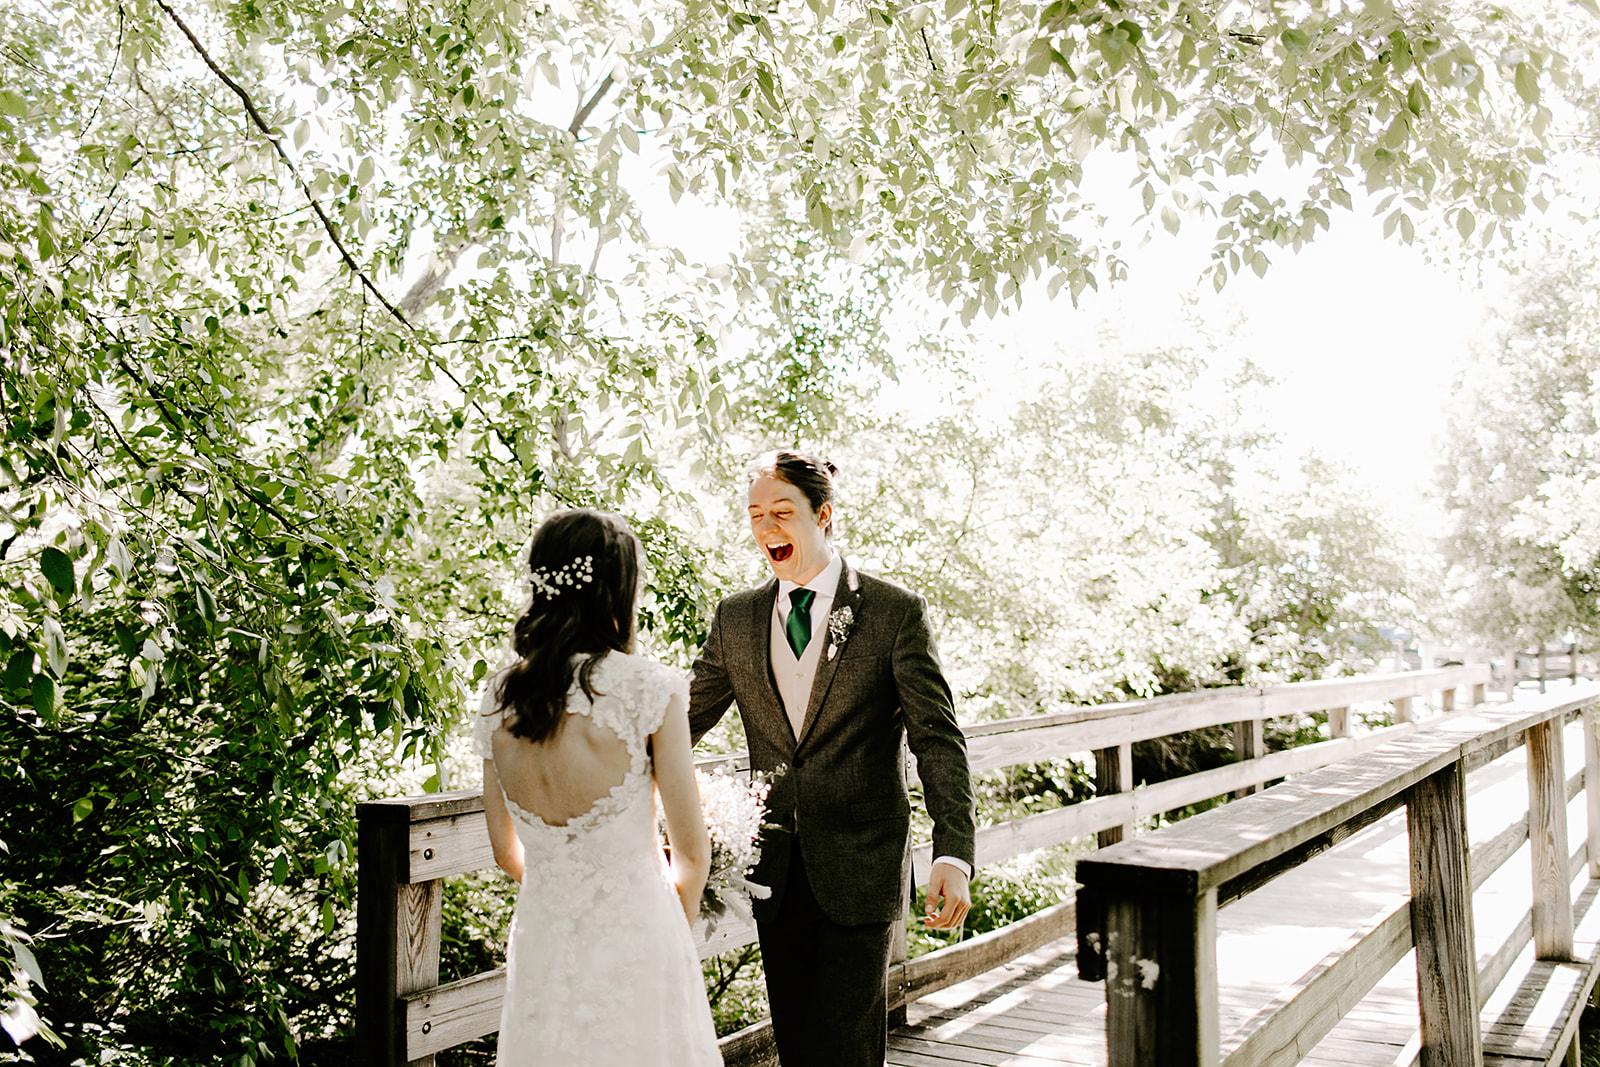 Lily and Easton Wedding Carmel Indiana Cool Creek Park Grace Church Emily Elyse Wehner Photography -87.jpg